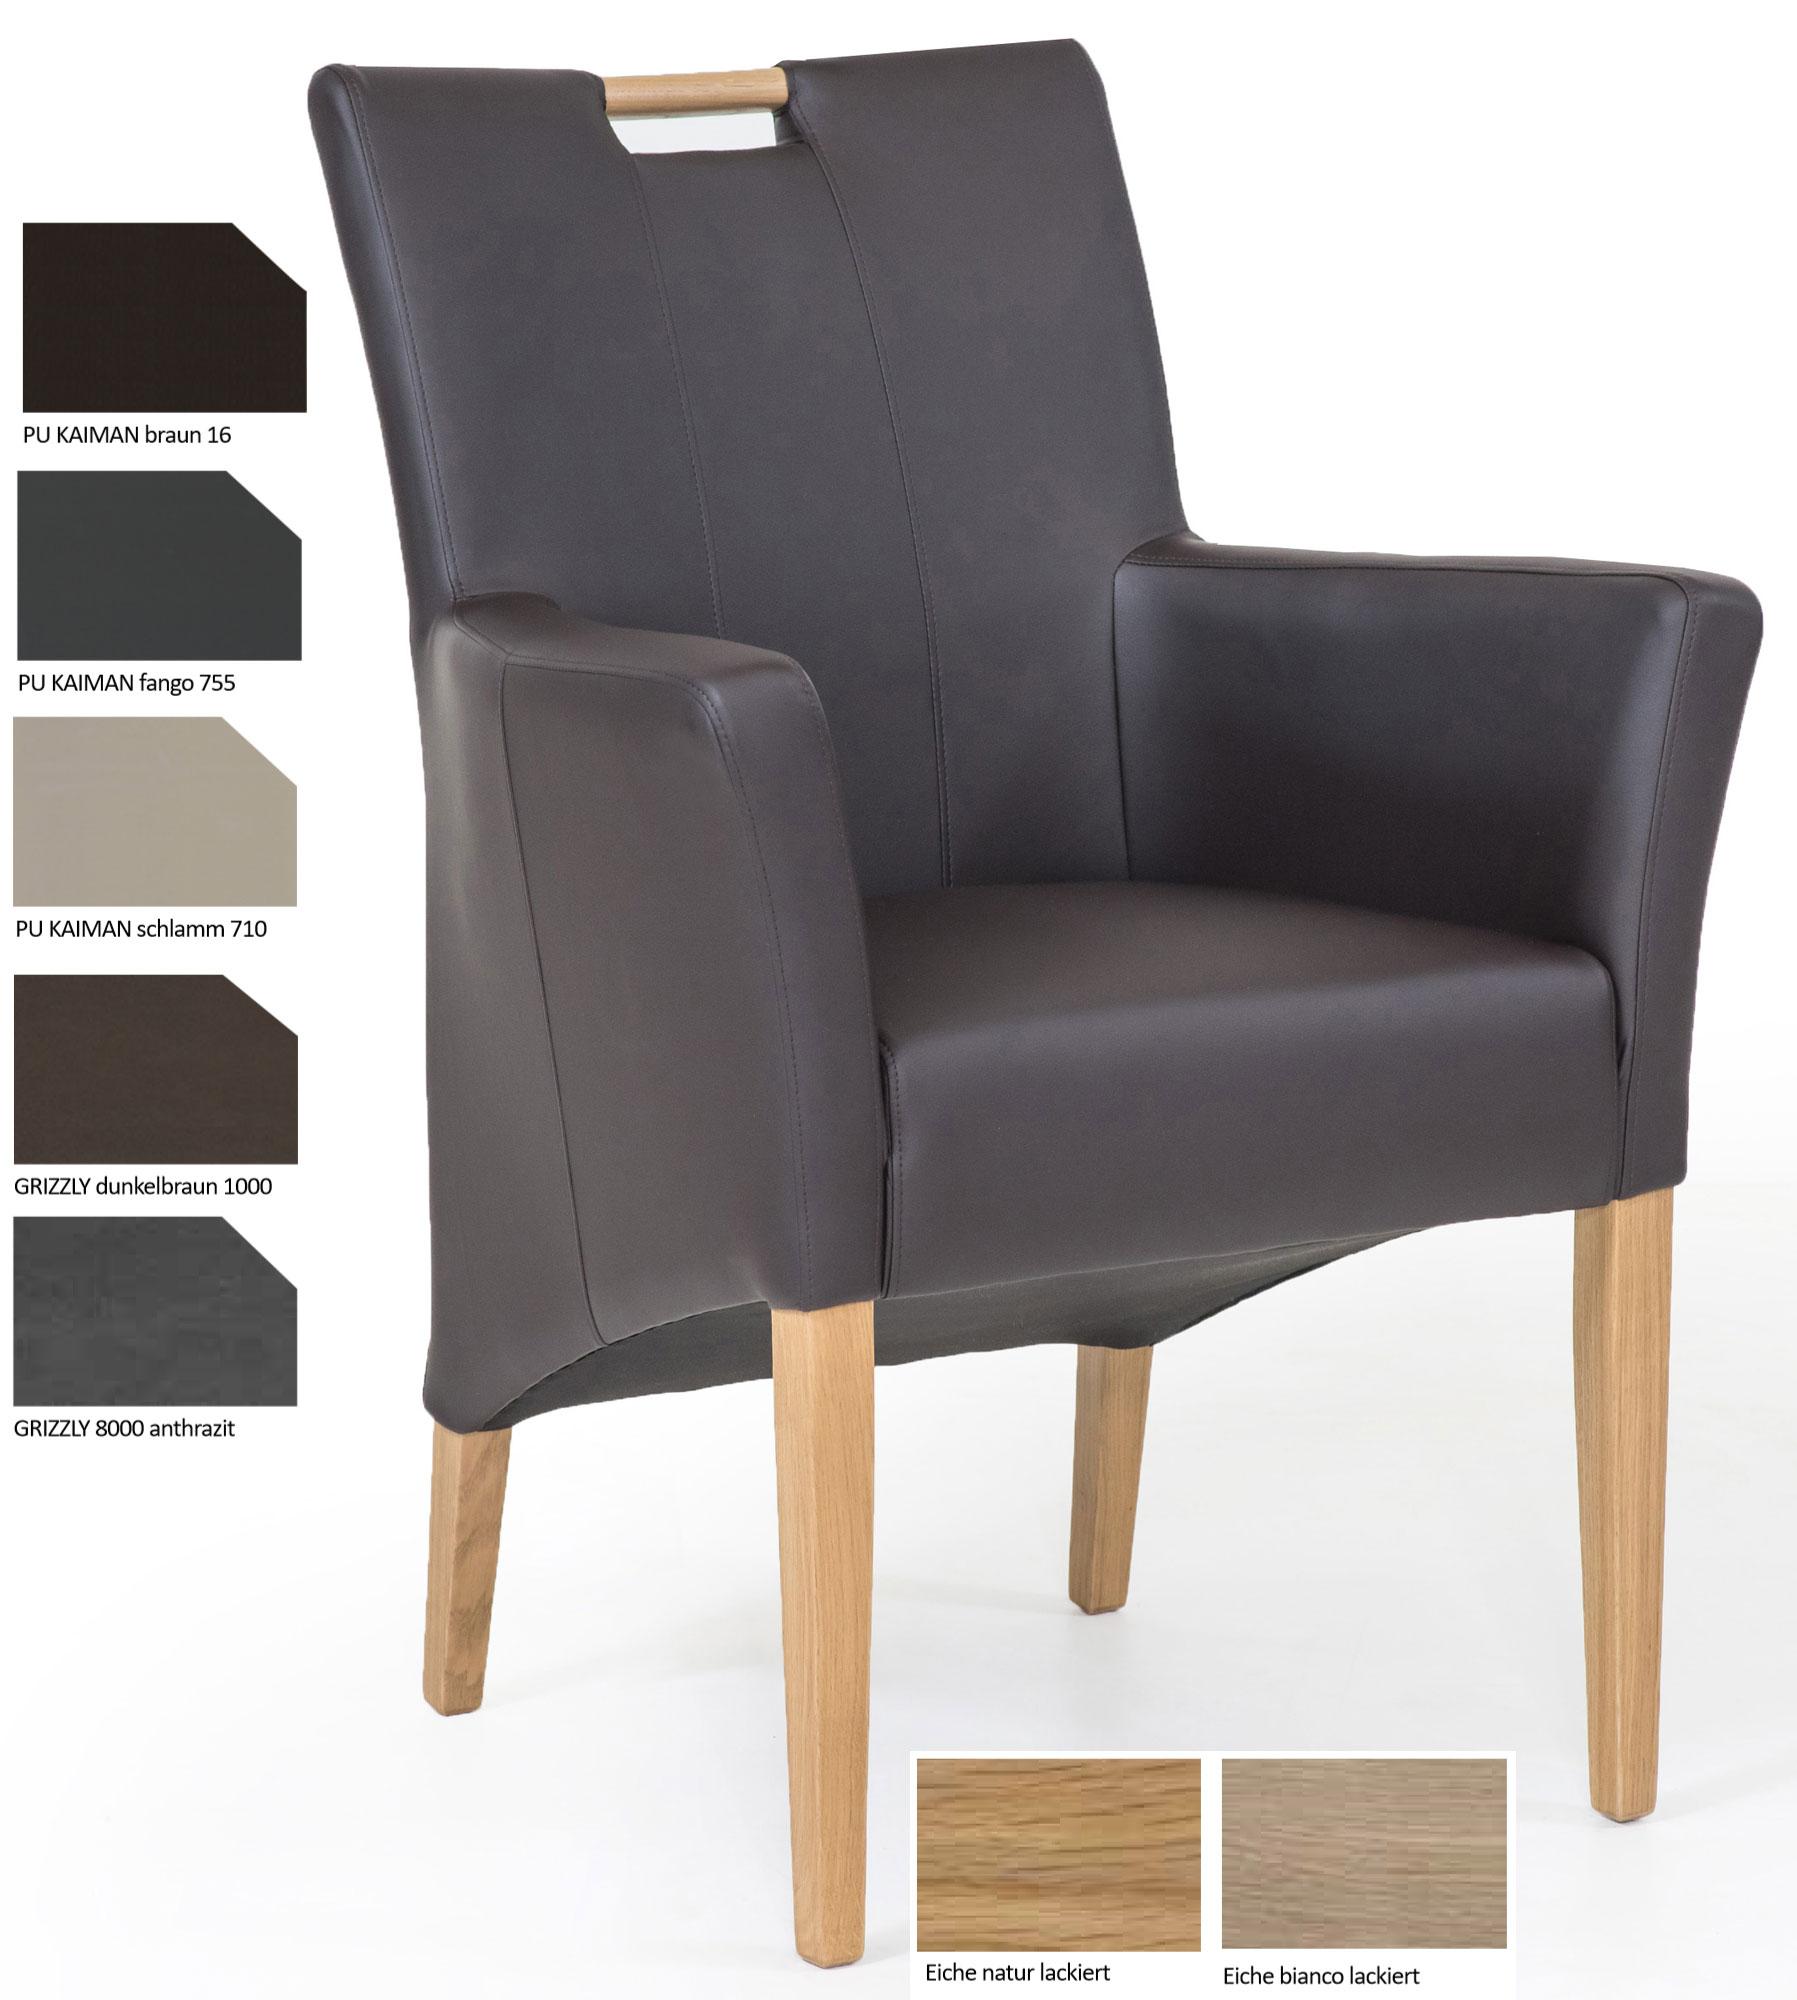 Standard Furniture Bastian Stuhlsessel Kunstleder grau